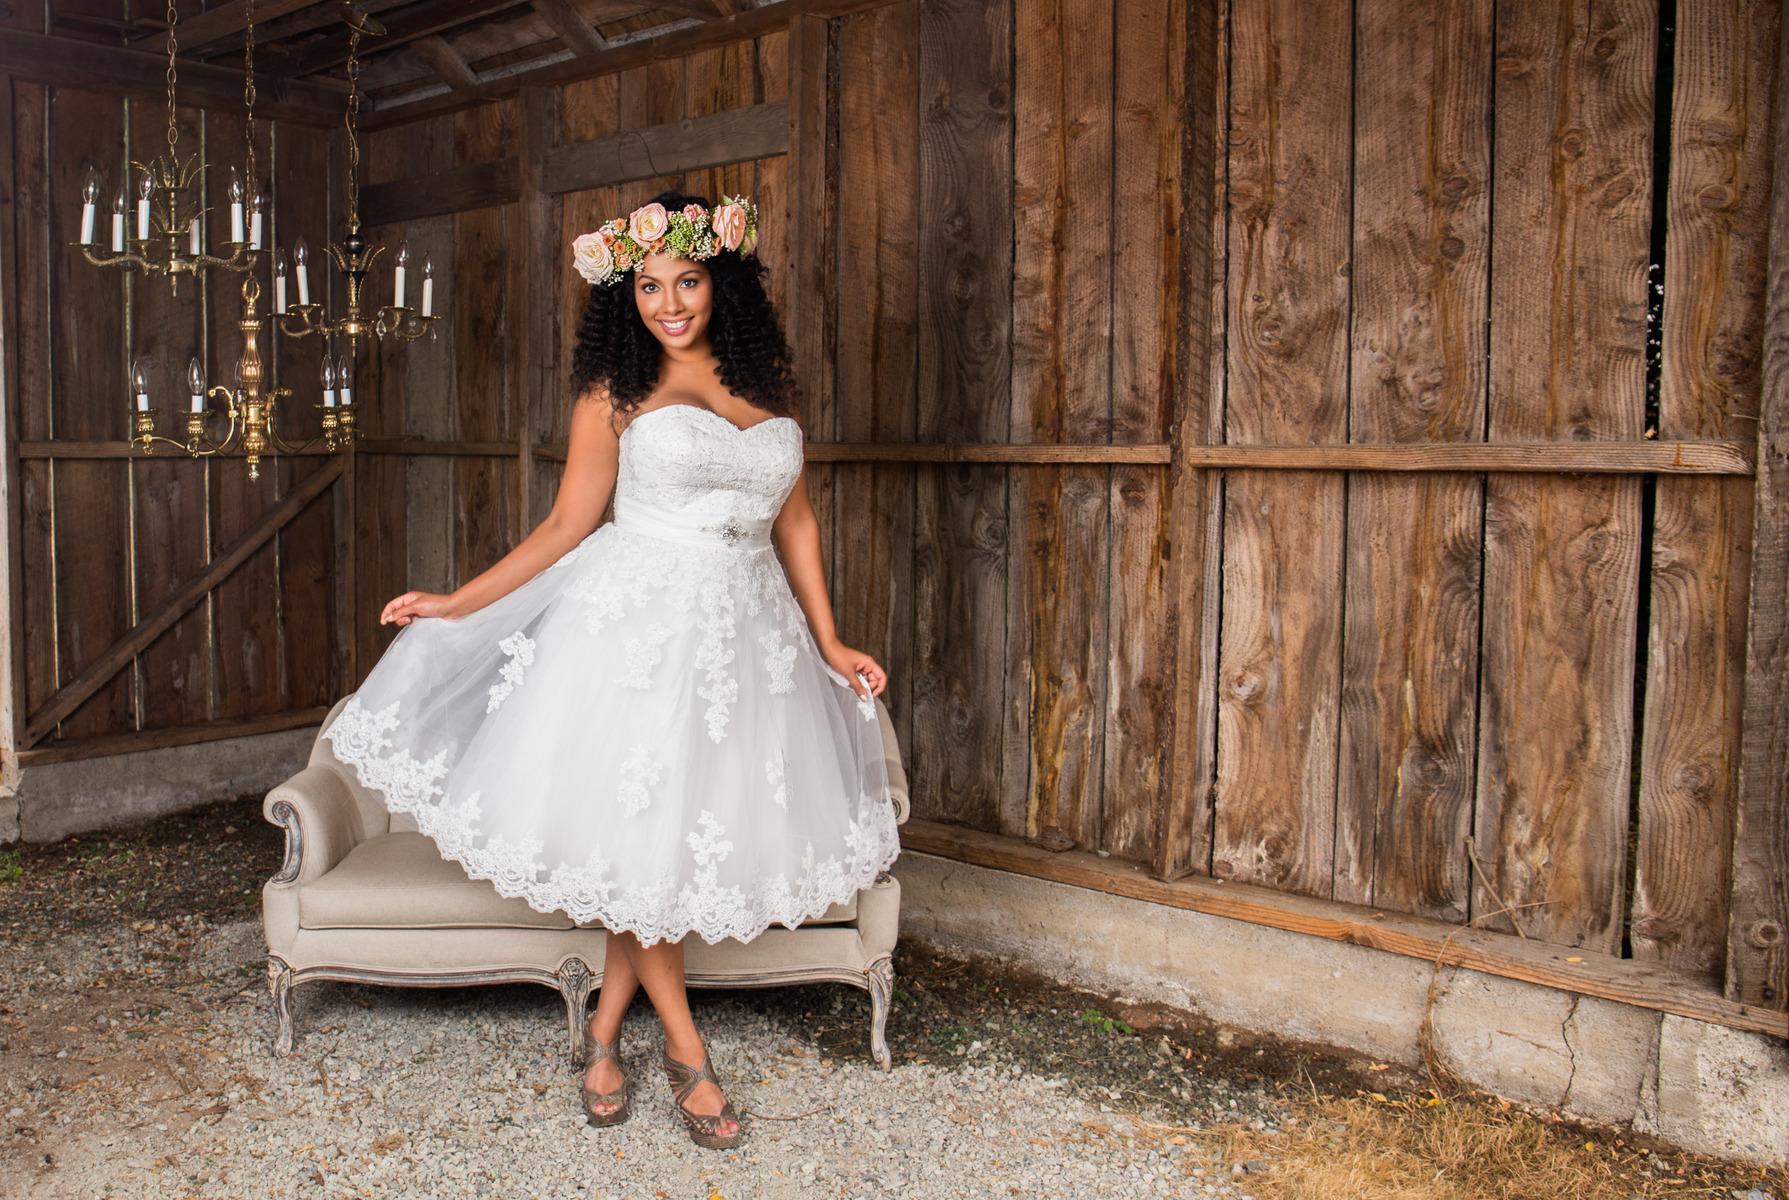 Tianna-Tran-Vancouver-Wedding-Makeup-Artist-Bridal-041.jpg